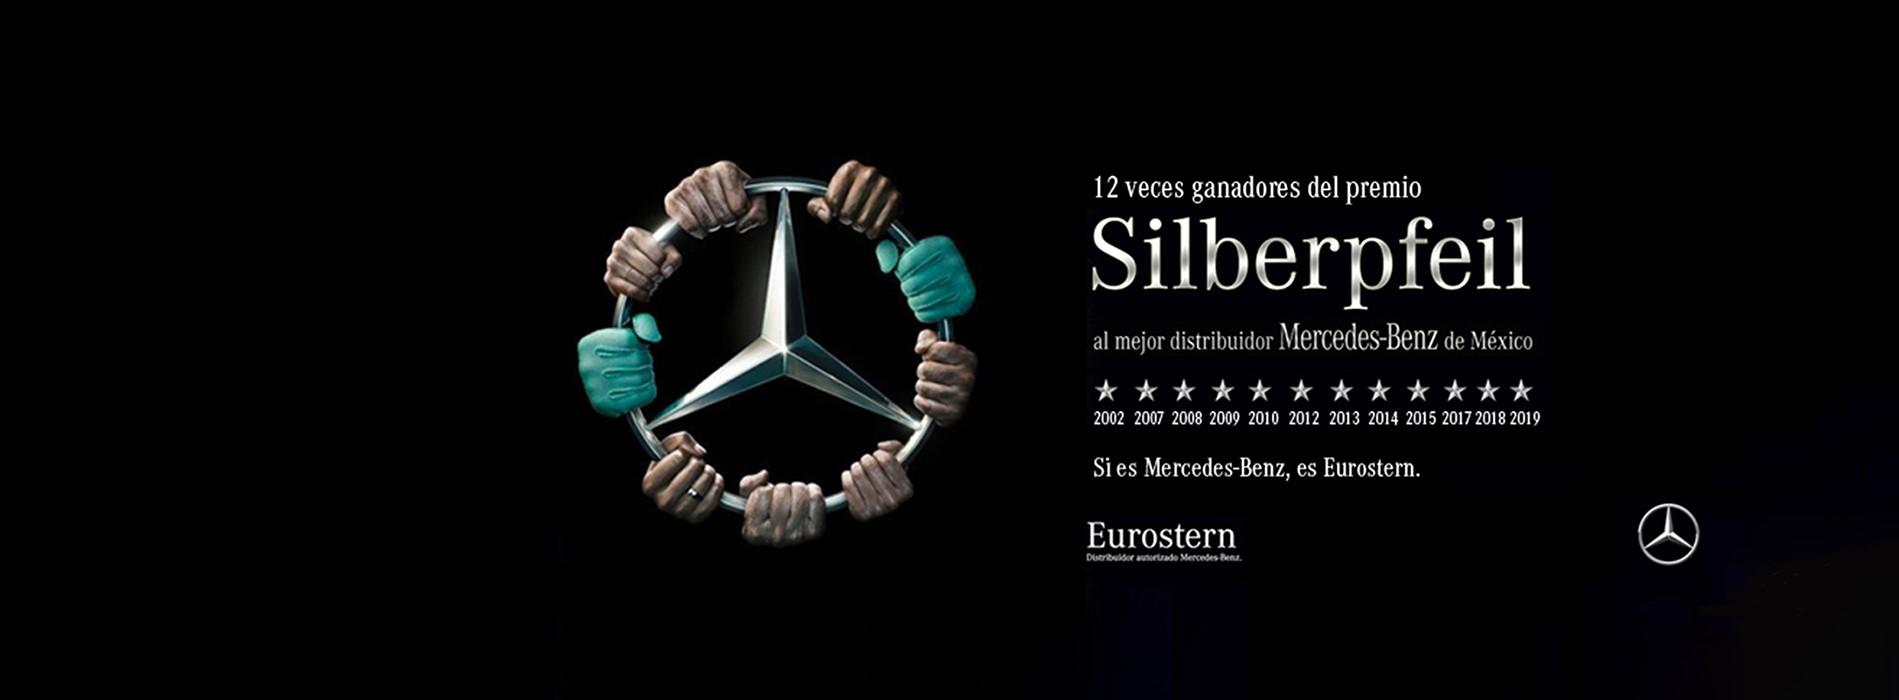 Mercedes-Benz Eurostern